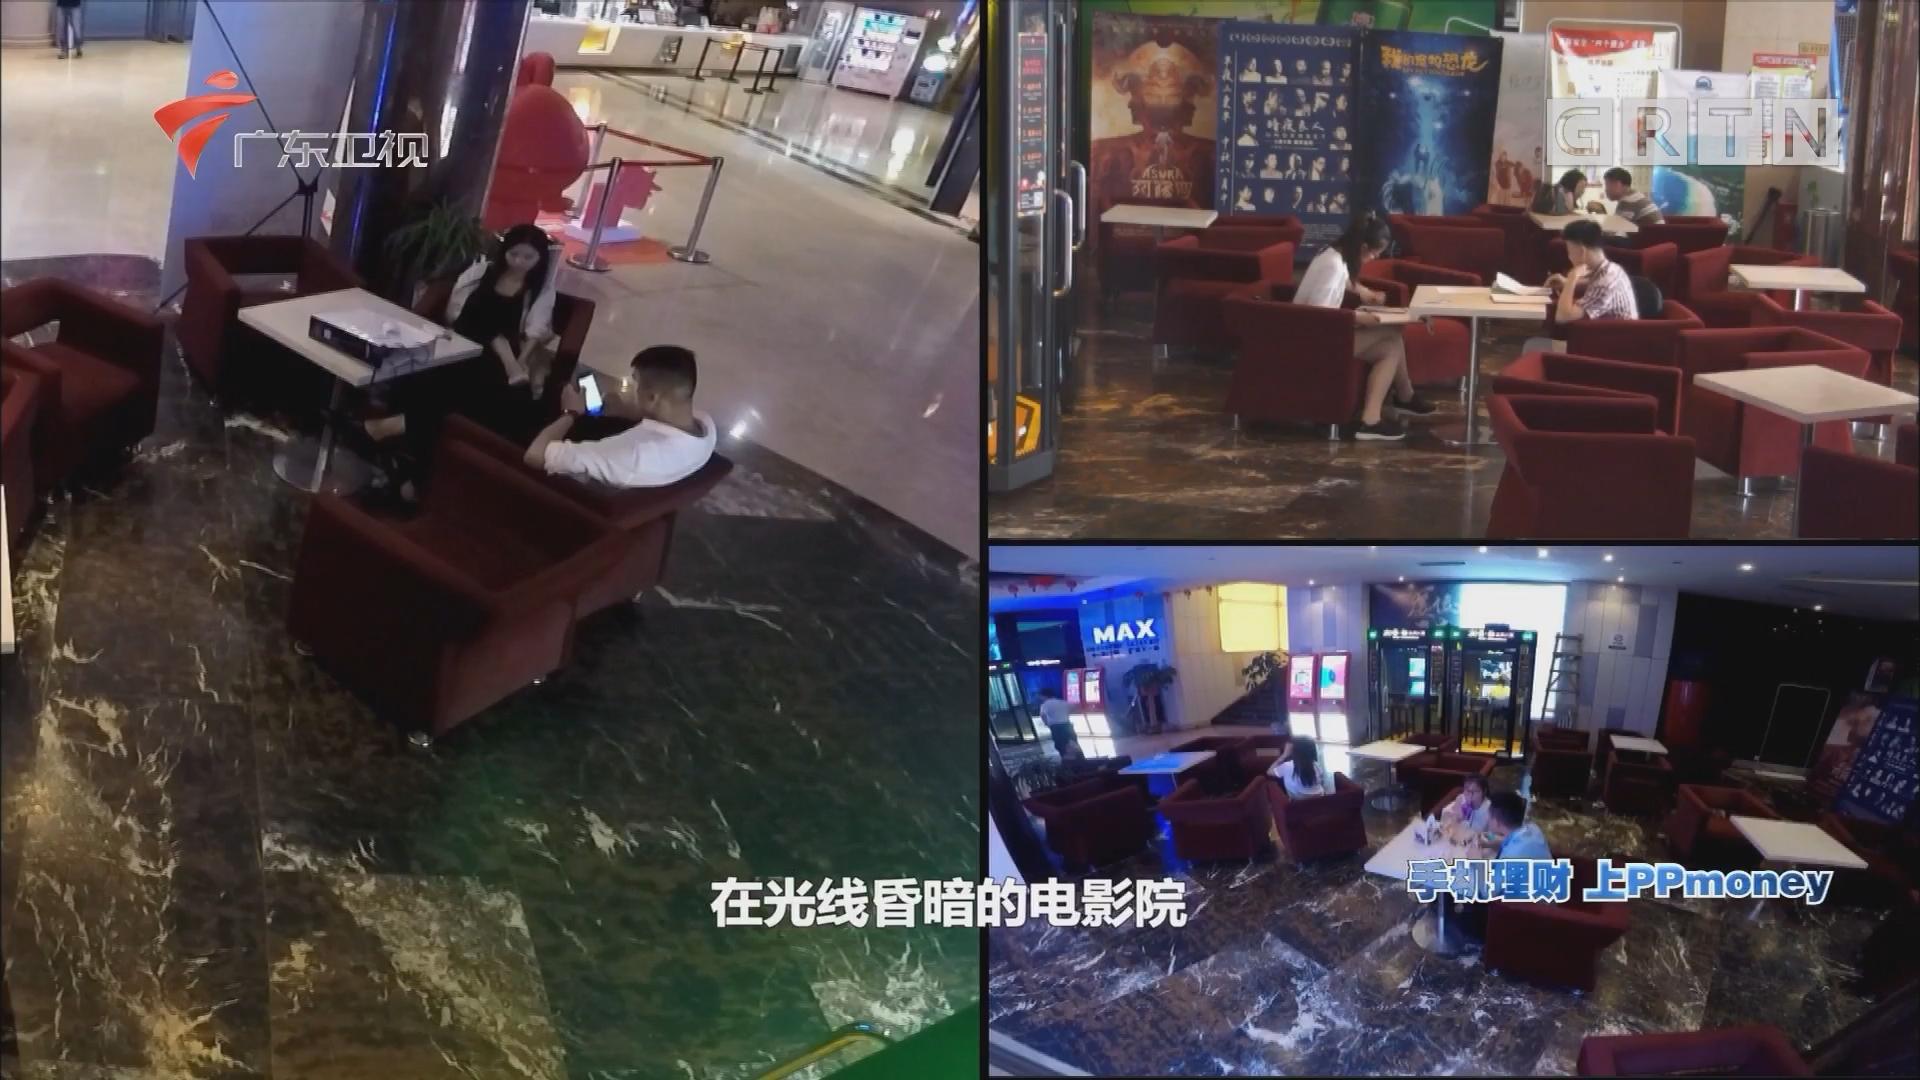 [HD][2018-07-19]你会怎么做:当目睹女性遭遇偷拍,你会怎么做?